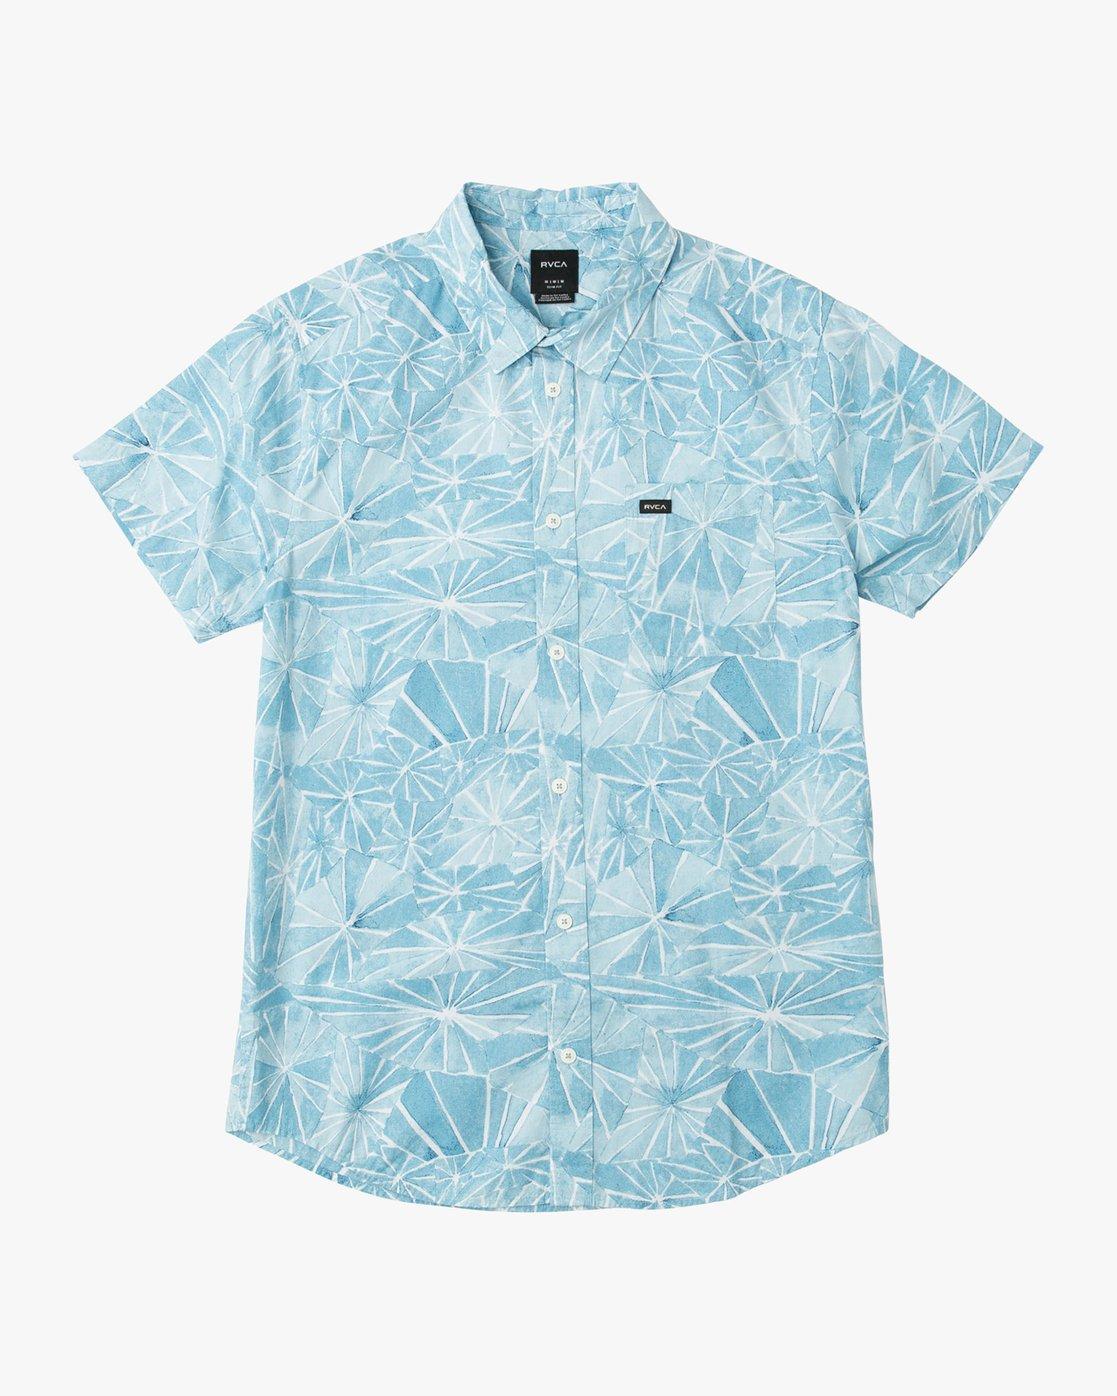 0 Blade Printed Button-Up Shirt Blue M508QRBL RVCA